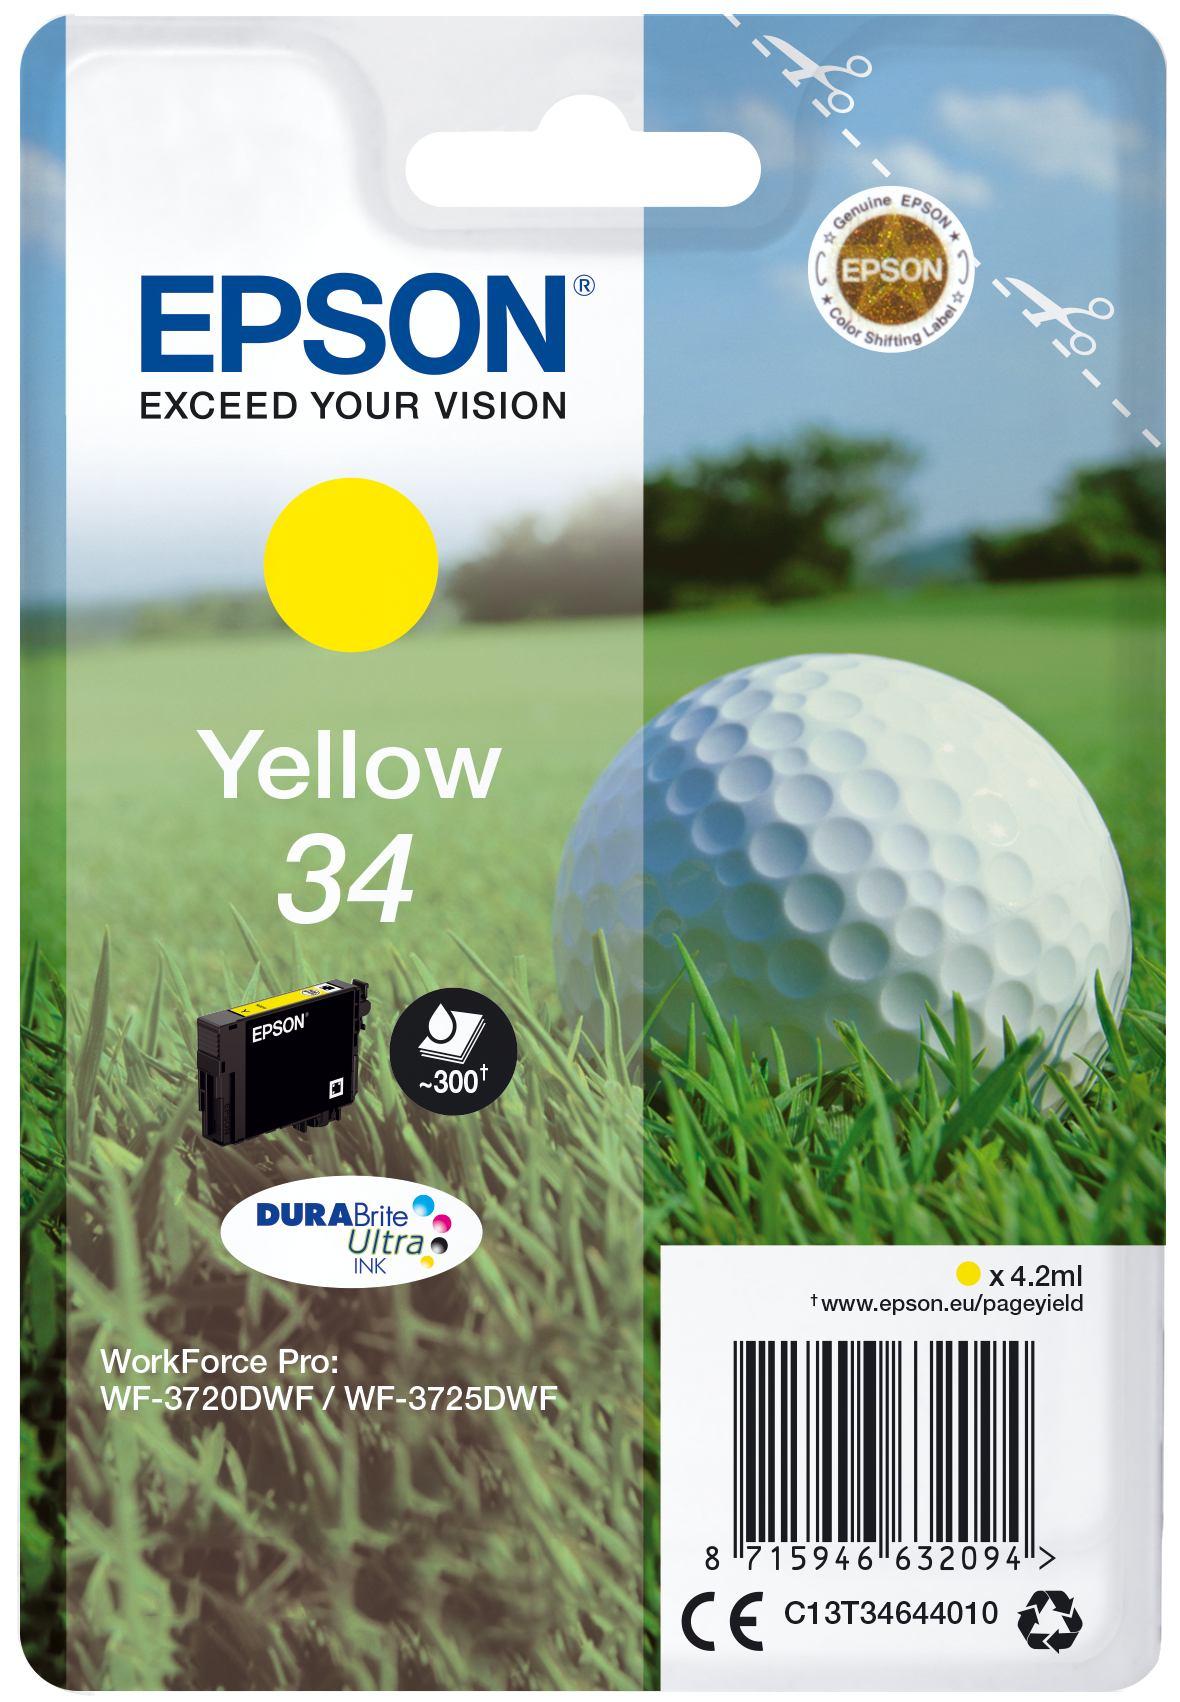 2081504-e-Golf-ball-Singlepack-Yellow-34-DURABrite-Ultra-Ink-SINGLE-YELLOW-34